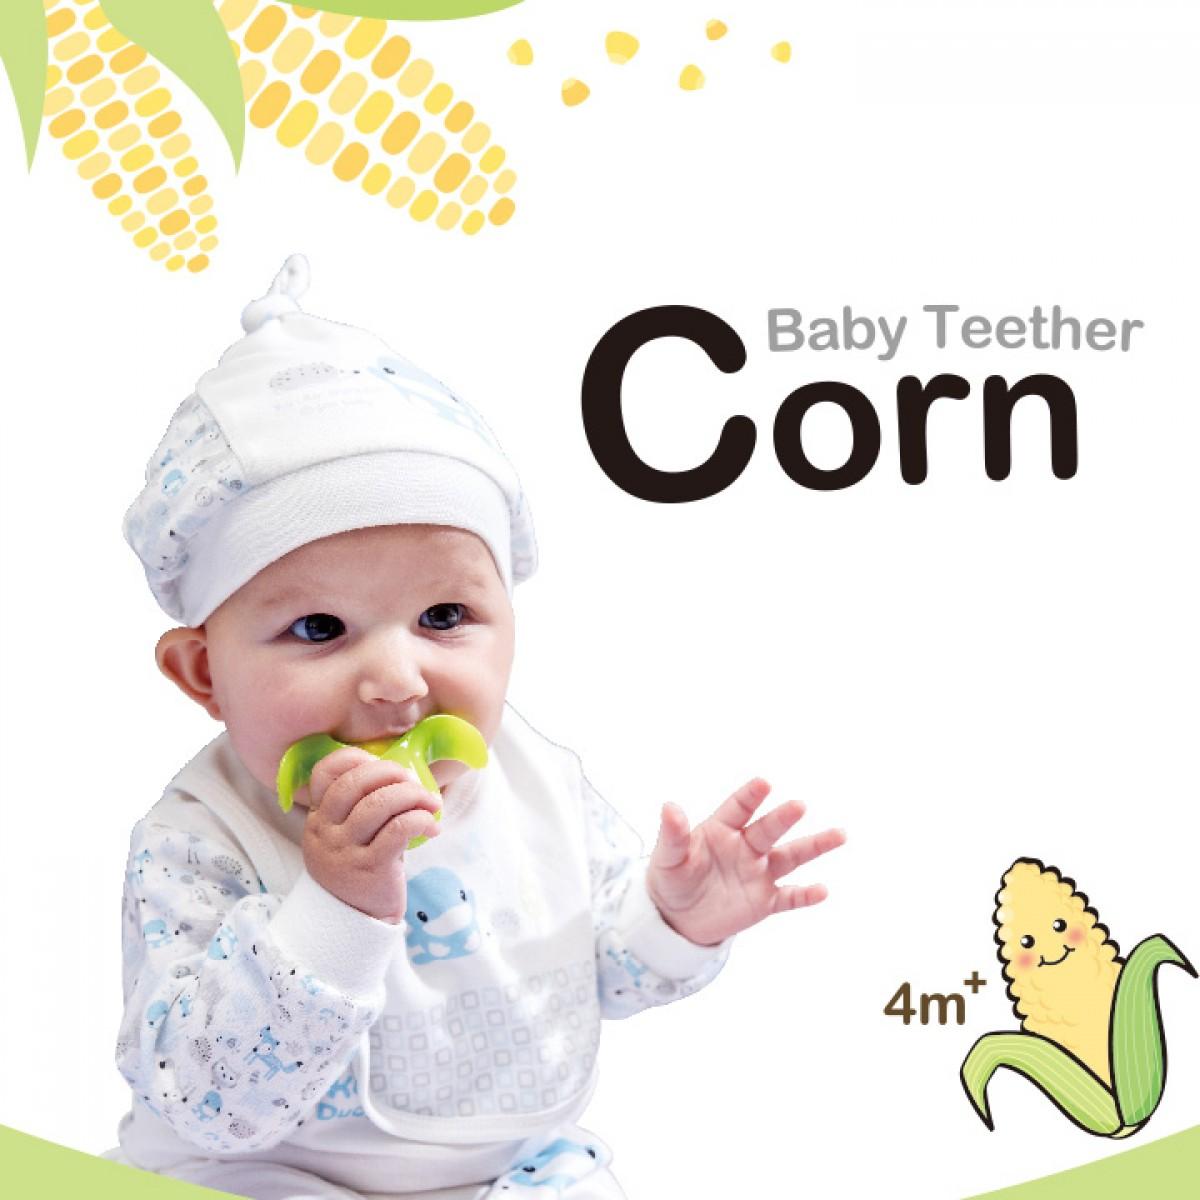 Kuku Duckbill Baby Teether - Corn - 10M+